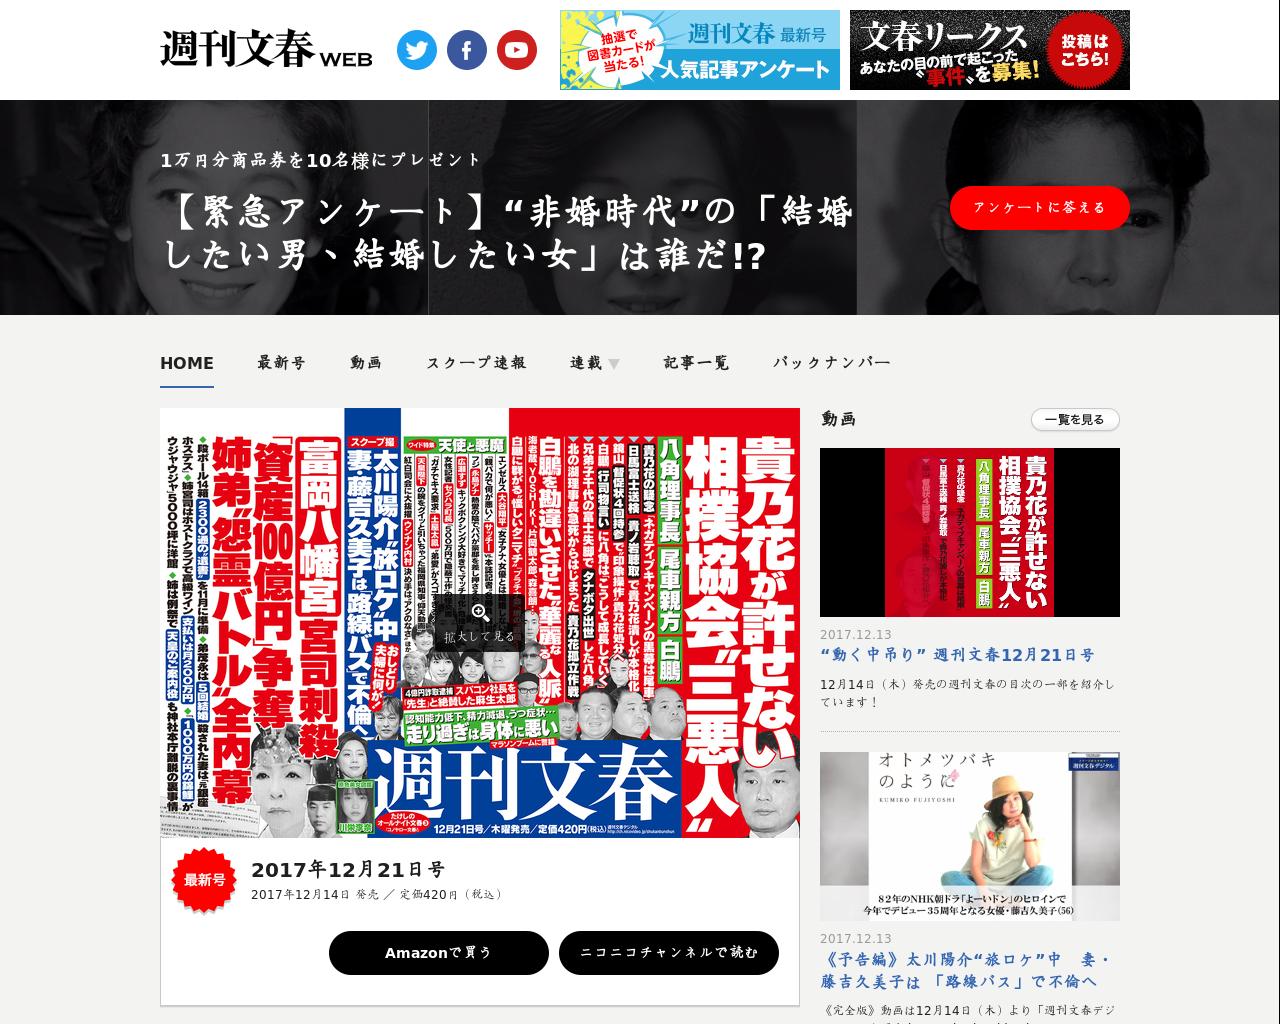 shukan.bunshun.jp(2017/12/14 09:25:37)